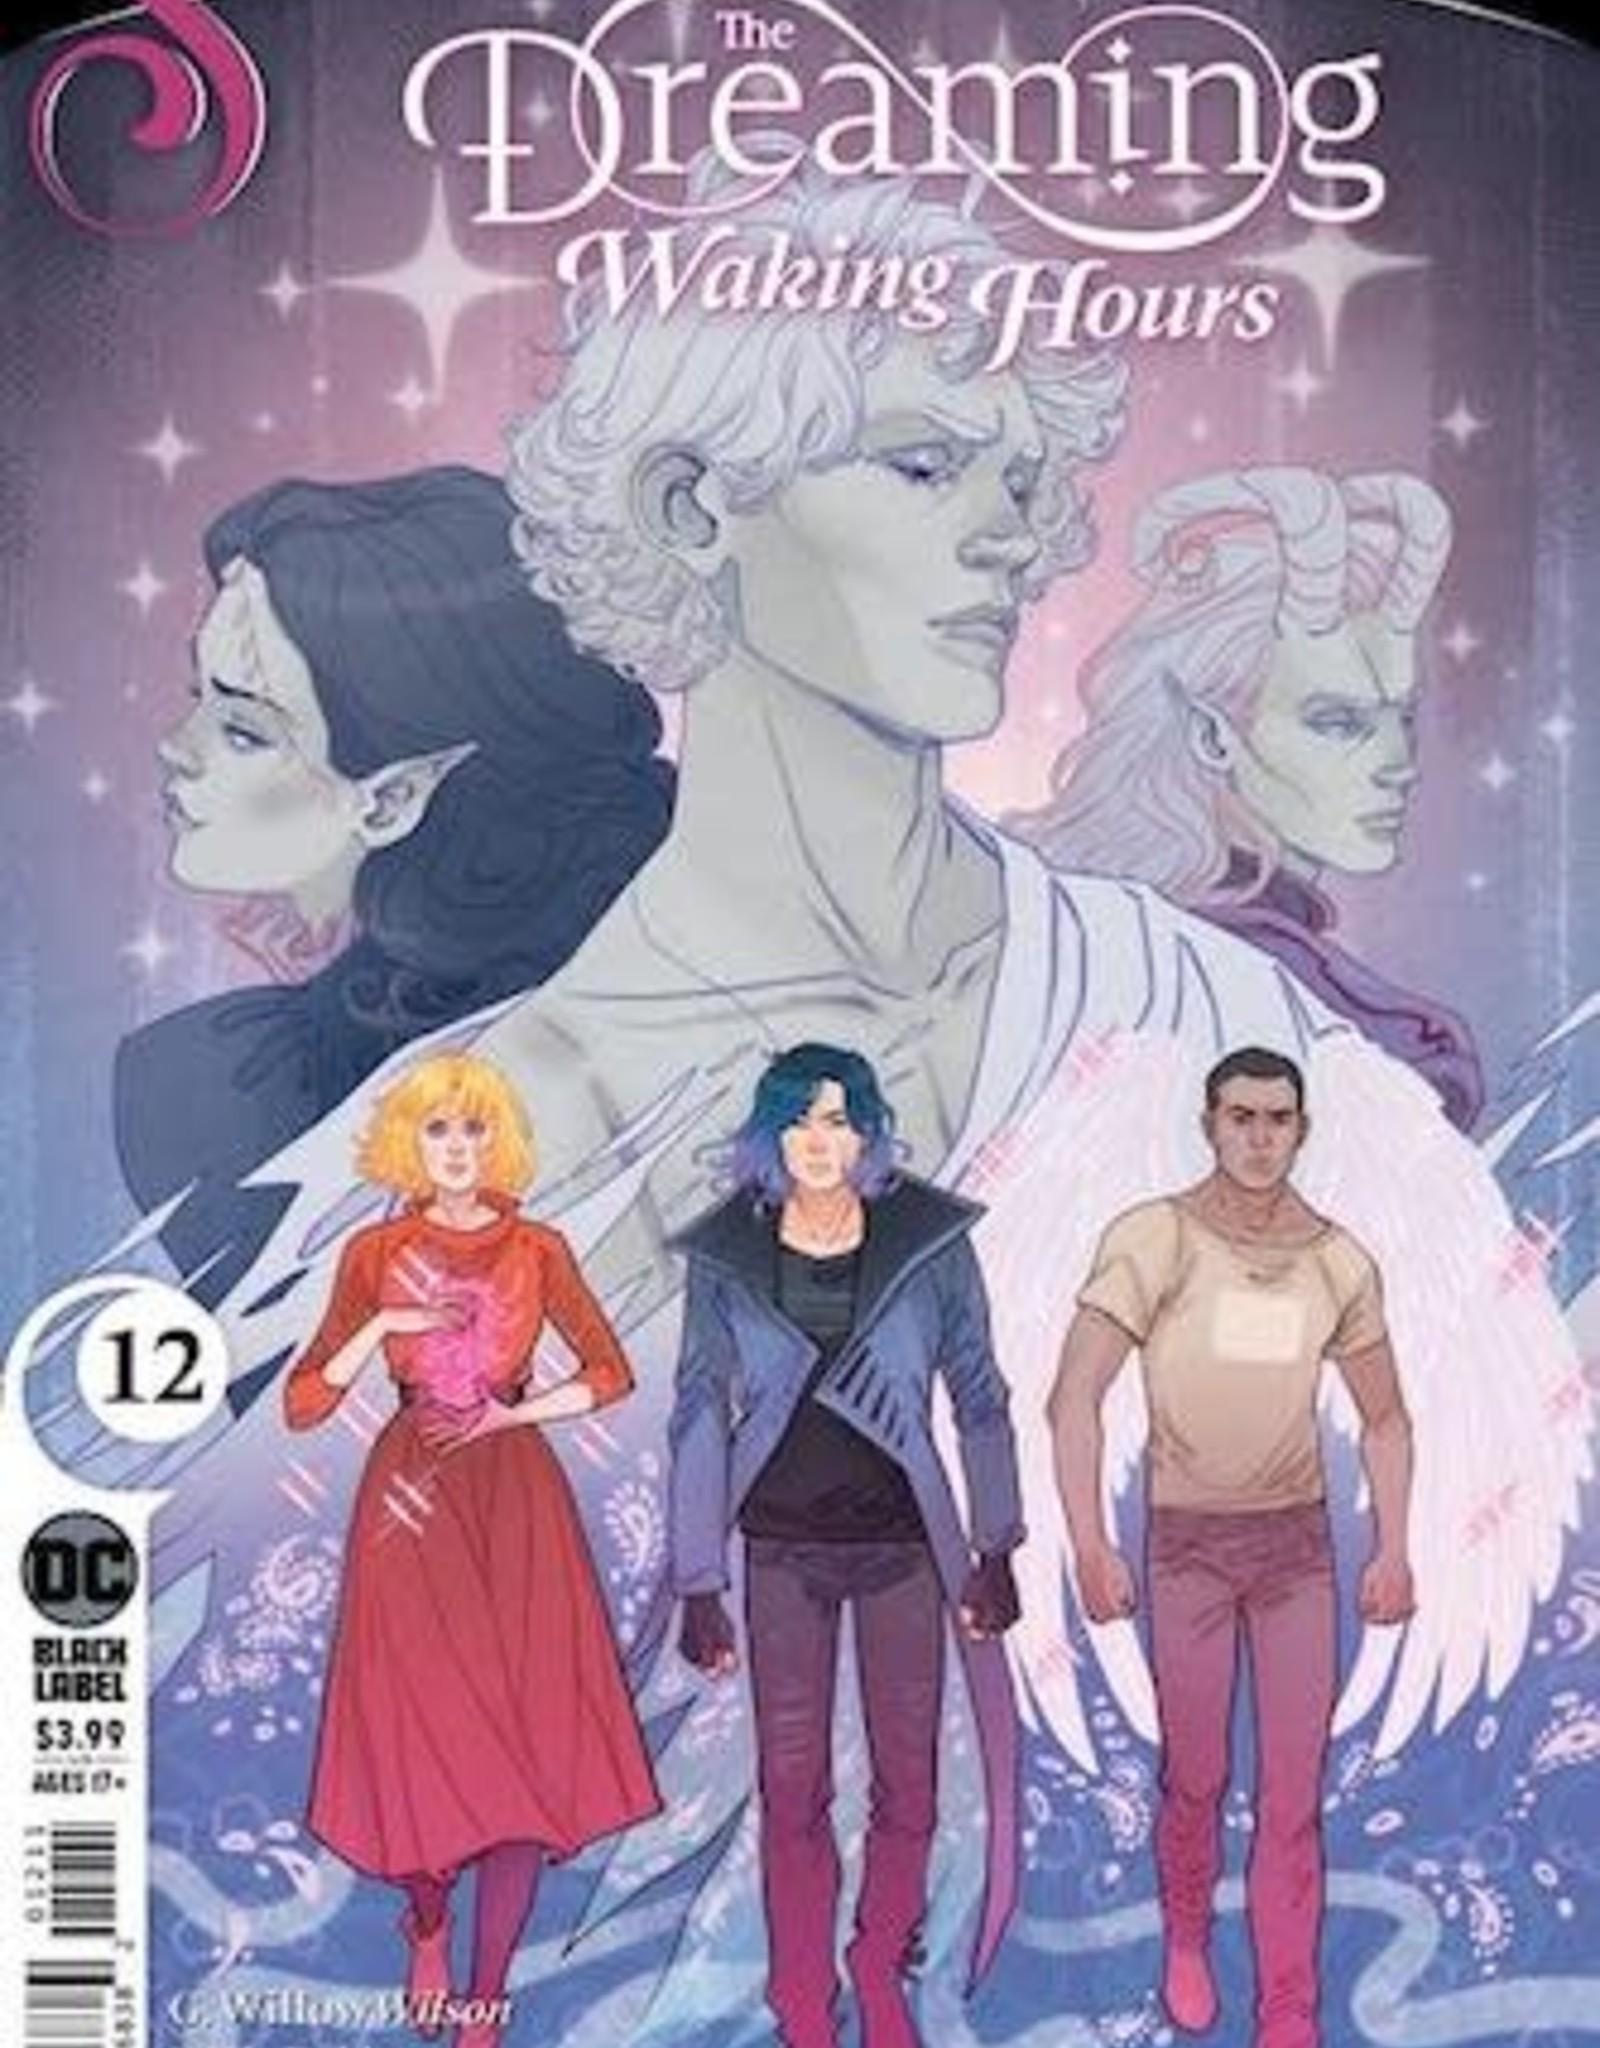 DC Comics Dreaming Waking Hours #12